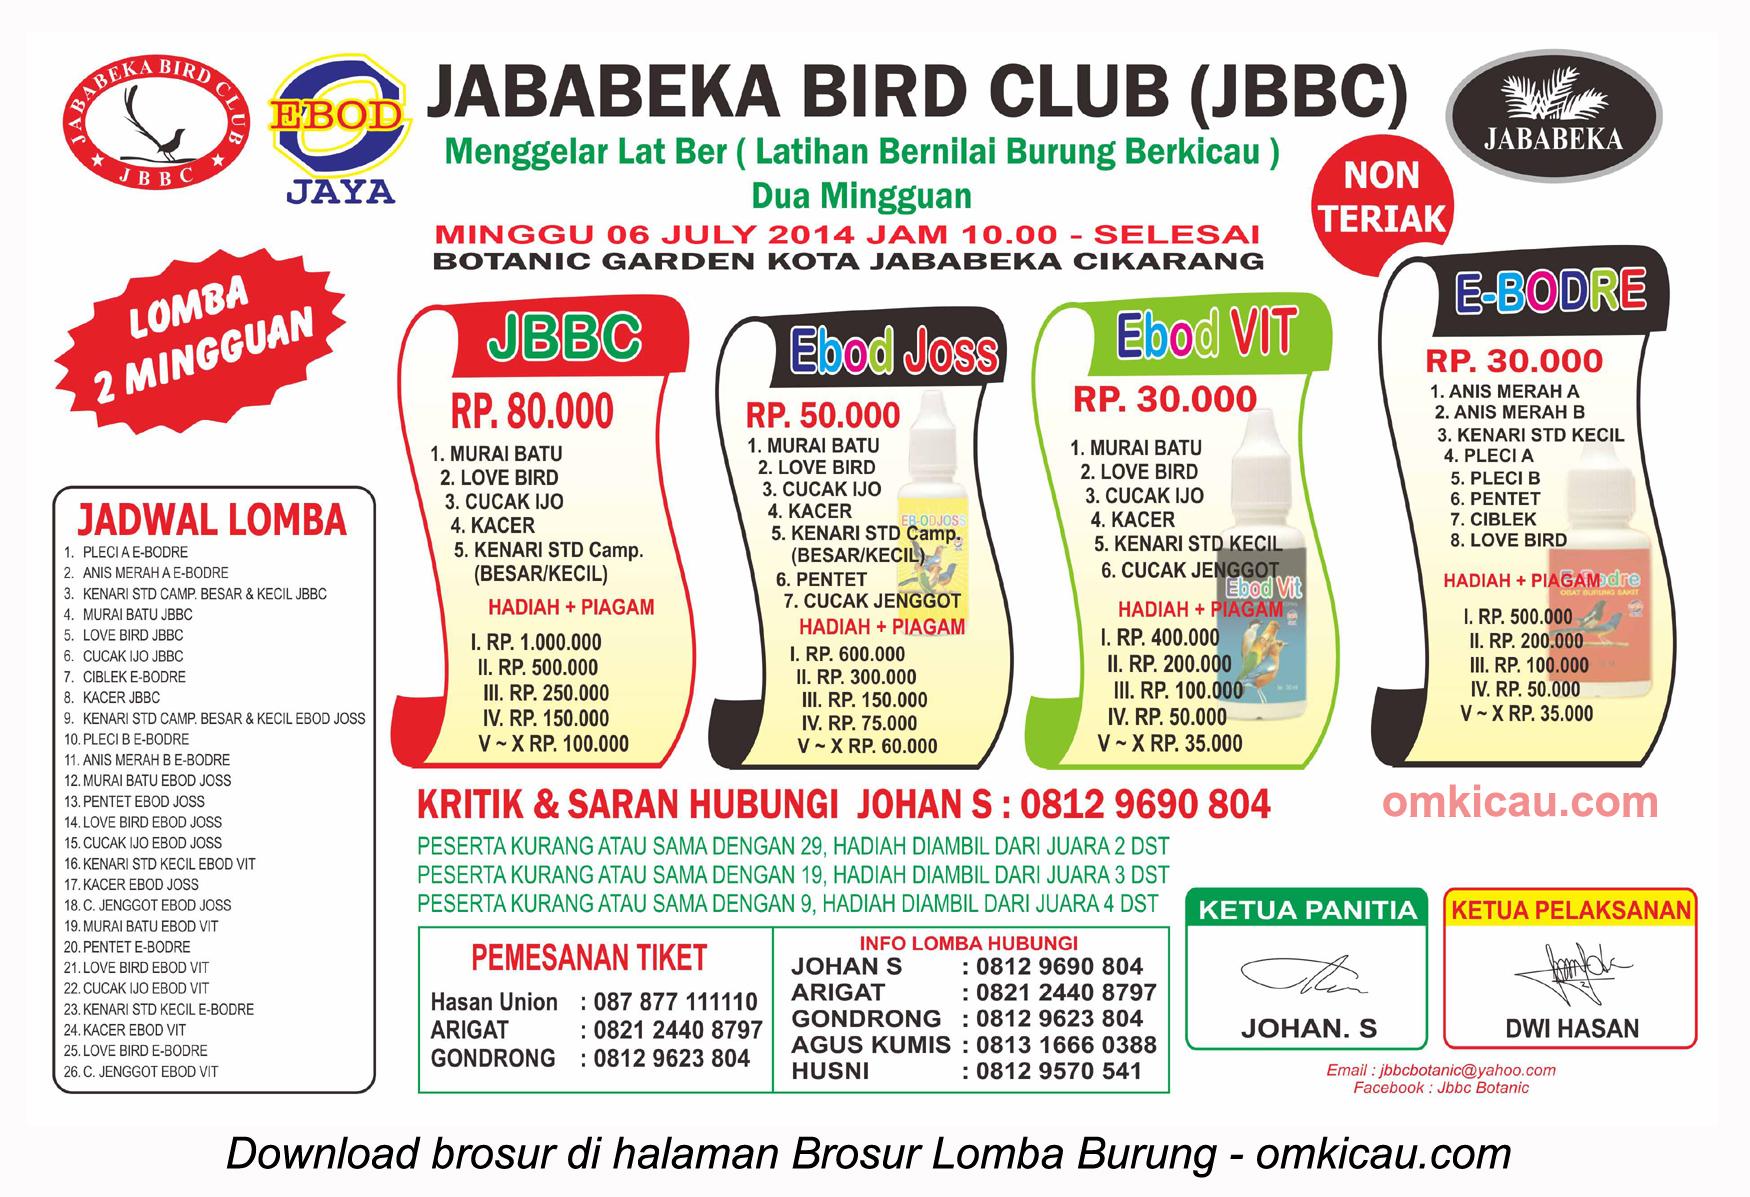 Latber Jababeka Bird Club Cikarang 6 Juli 2014